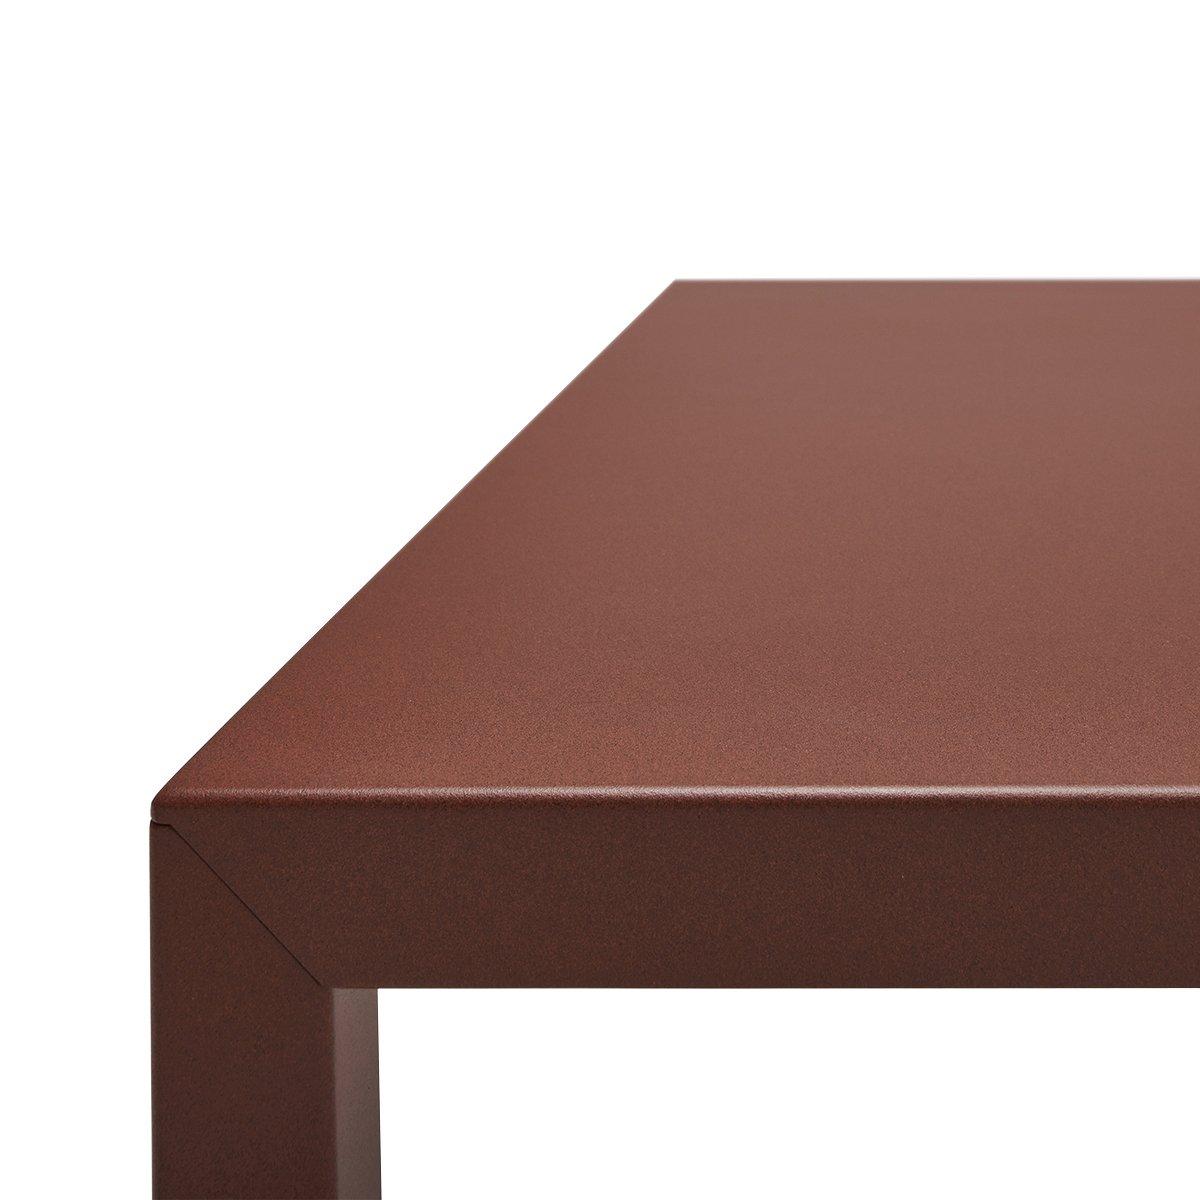 MDF Italia Tense Eettafel Outdoor - 280x120 - Corten